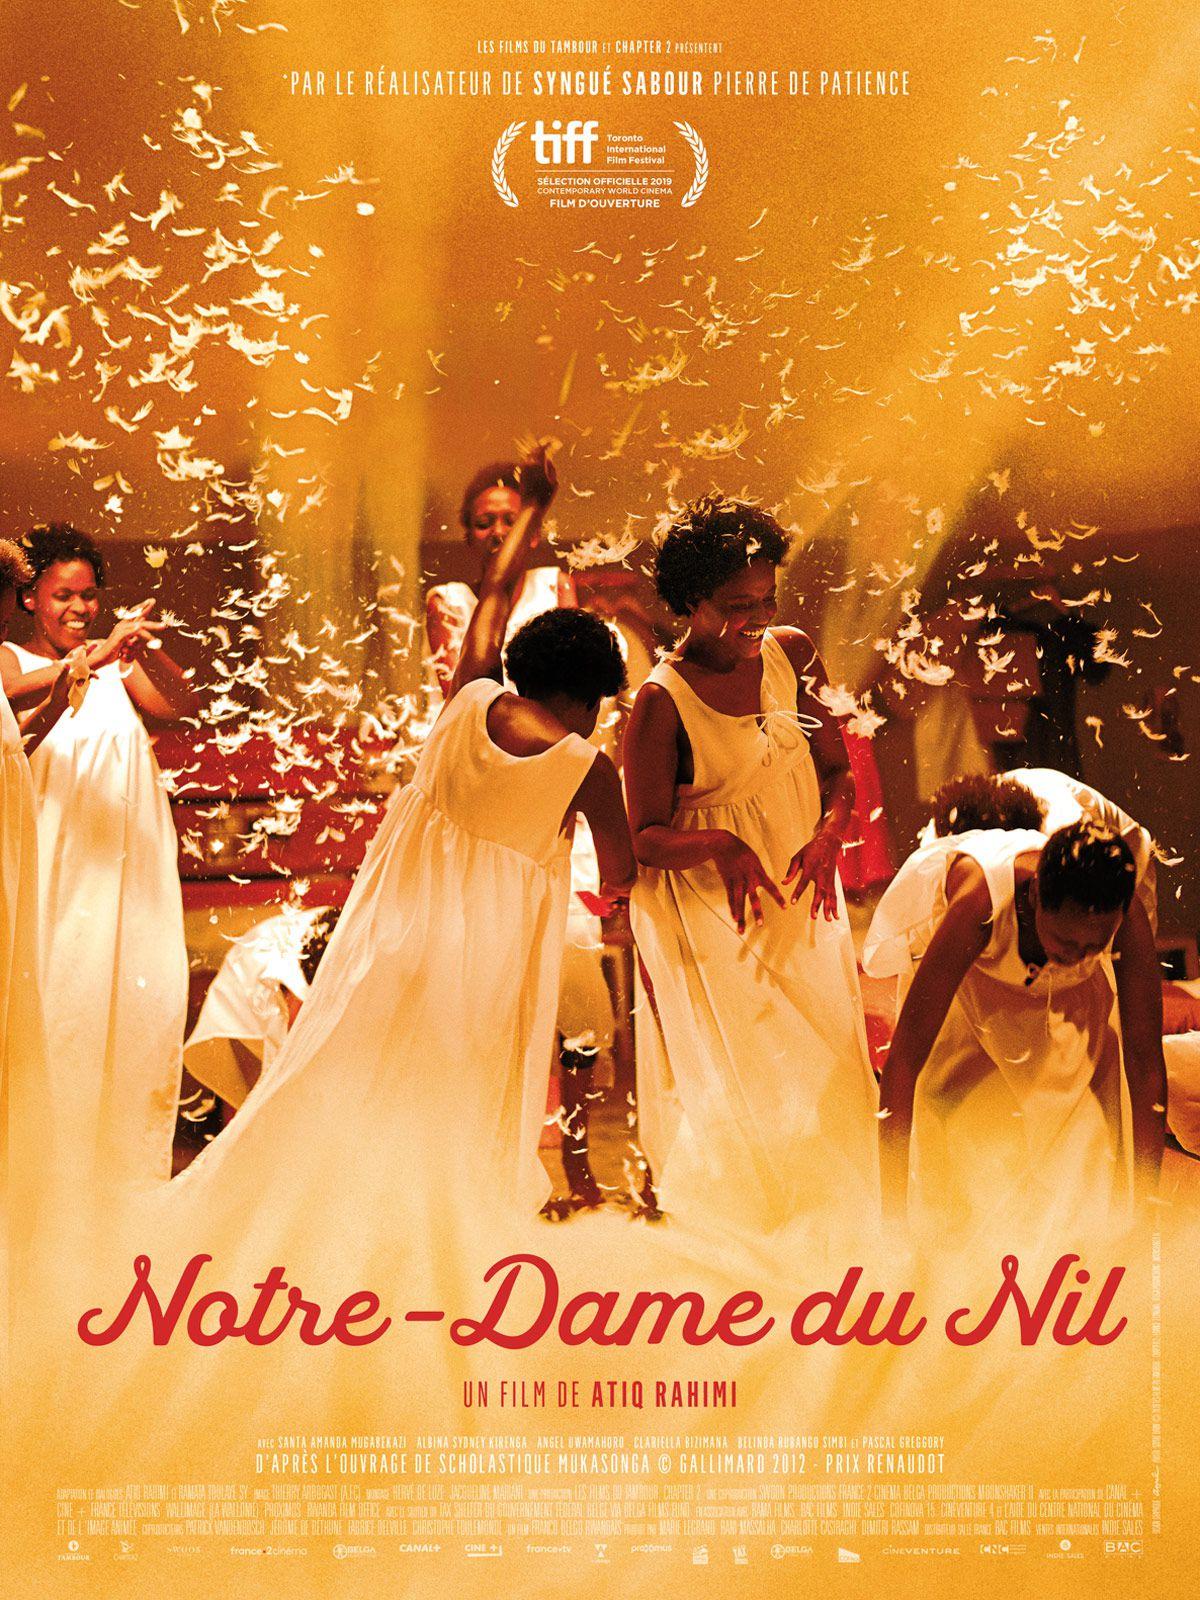 Notre-Dame du Nil - Film (2020)